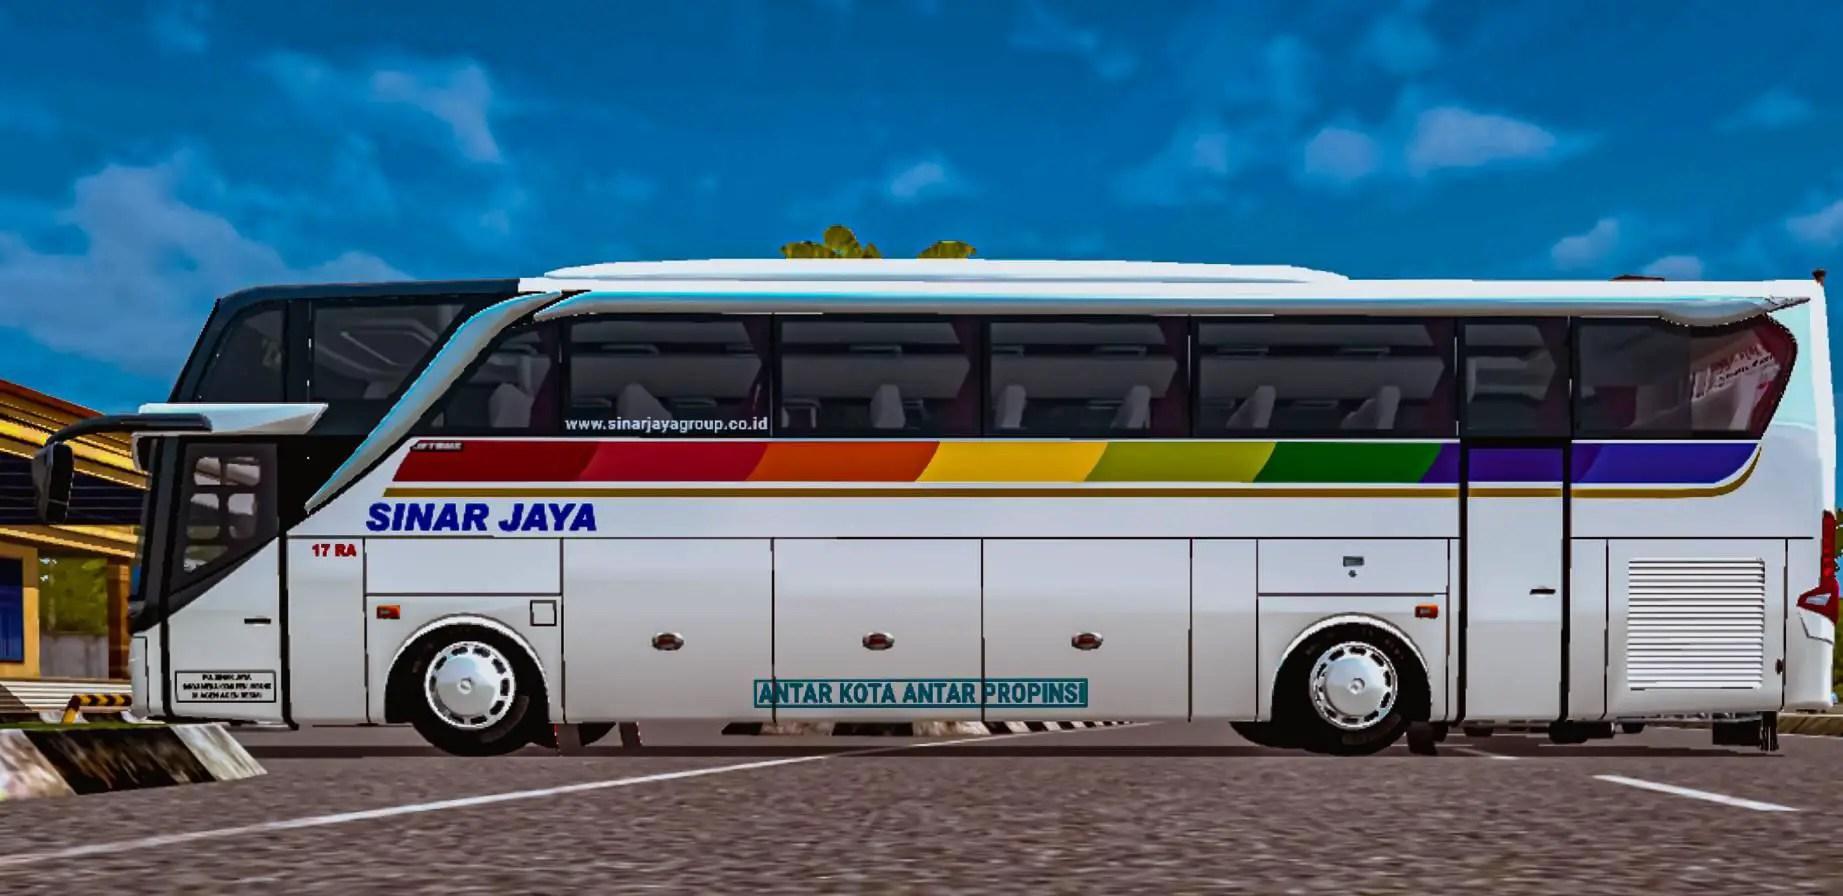 Download JetBus3 Mod for Bus Simulator Indonesia, JetBus3, BUSSID Bus Mod, BUSSID Vehicle Mod, JB3 Mod, JB3 SHD bus Mod, ZTOM